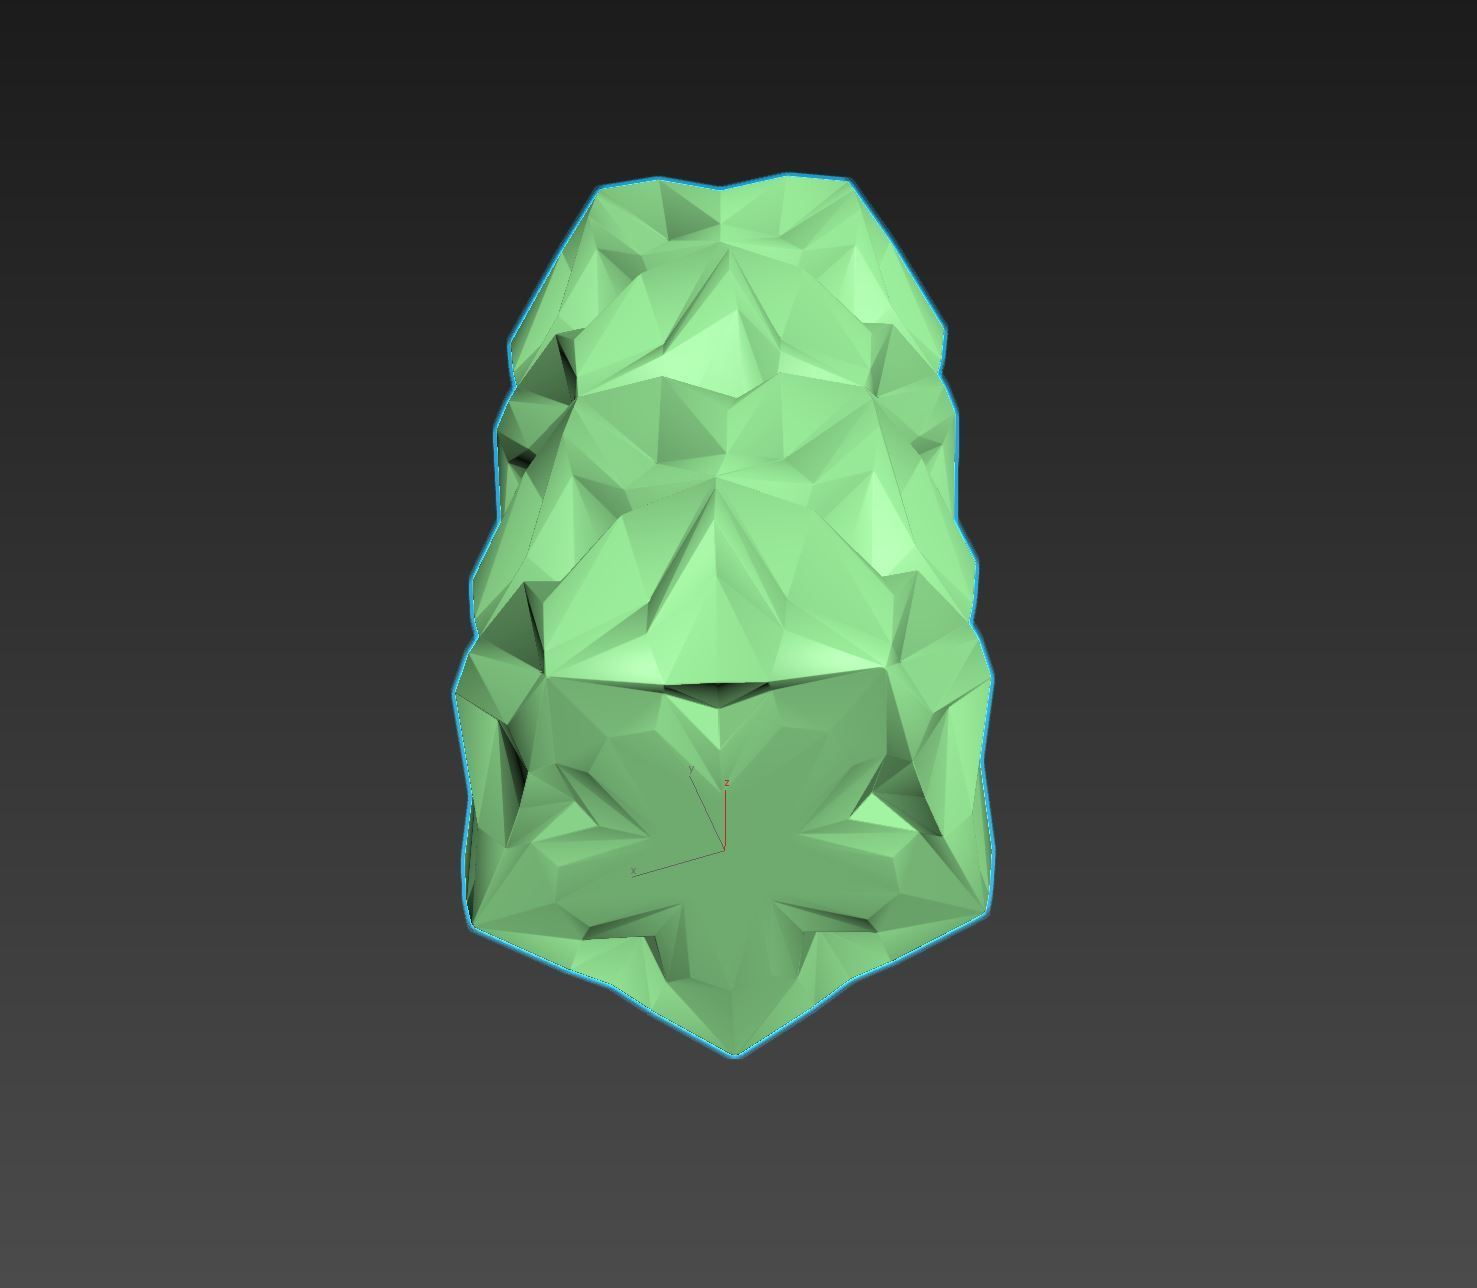 13.jpg Download free STL file Geometric Vase • 3D printable object, tridimagina